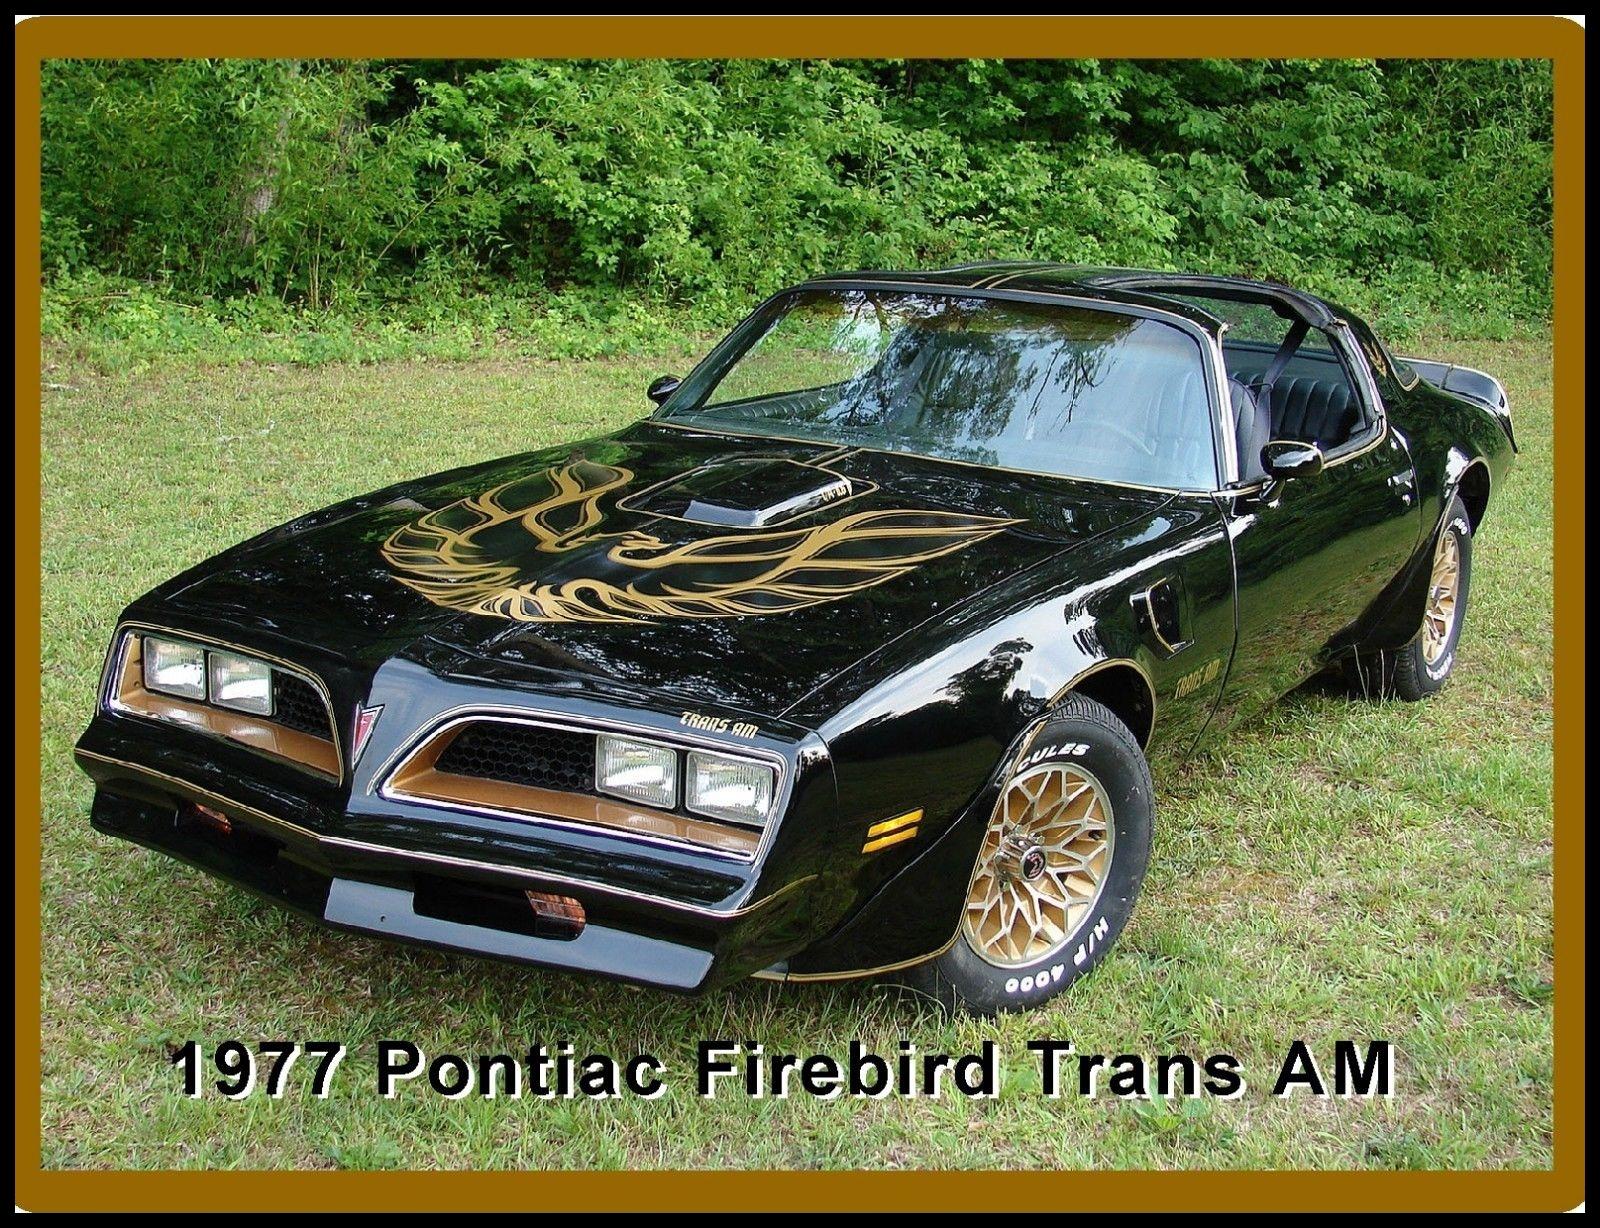 $5 5 1977 Pontiac Firebird Trans Am Auto Car Refrigerator Tool Box Magnet ebay Collectibles